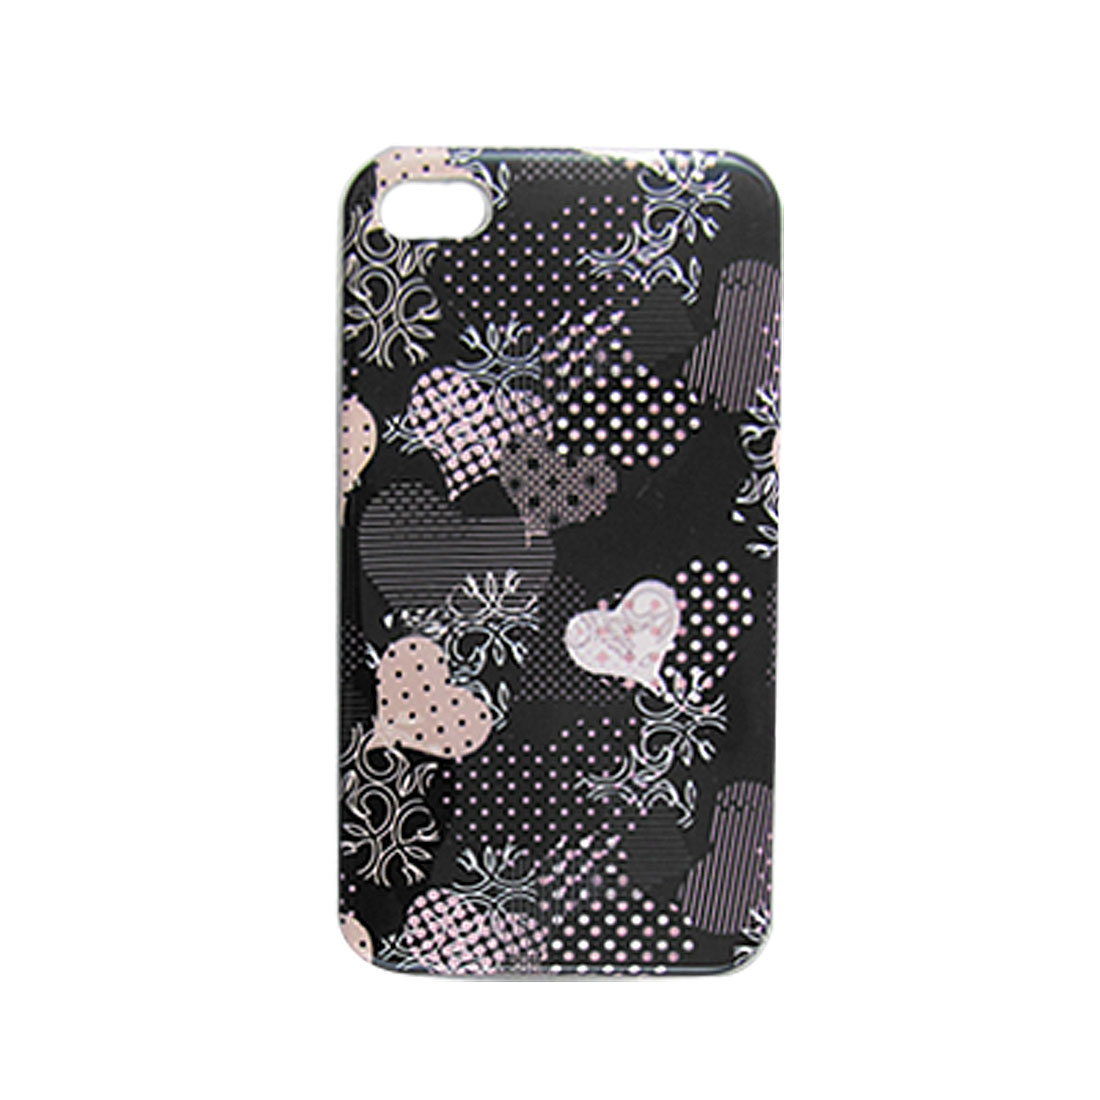 IMD Dot Heart Print Hard Plastic Shell Cover for iPhone 4 4G 4S